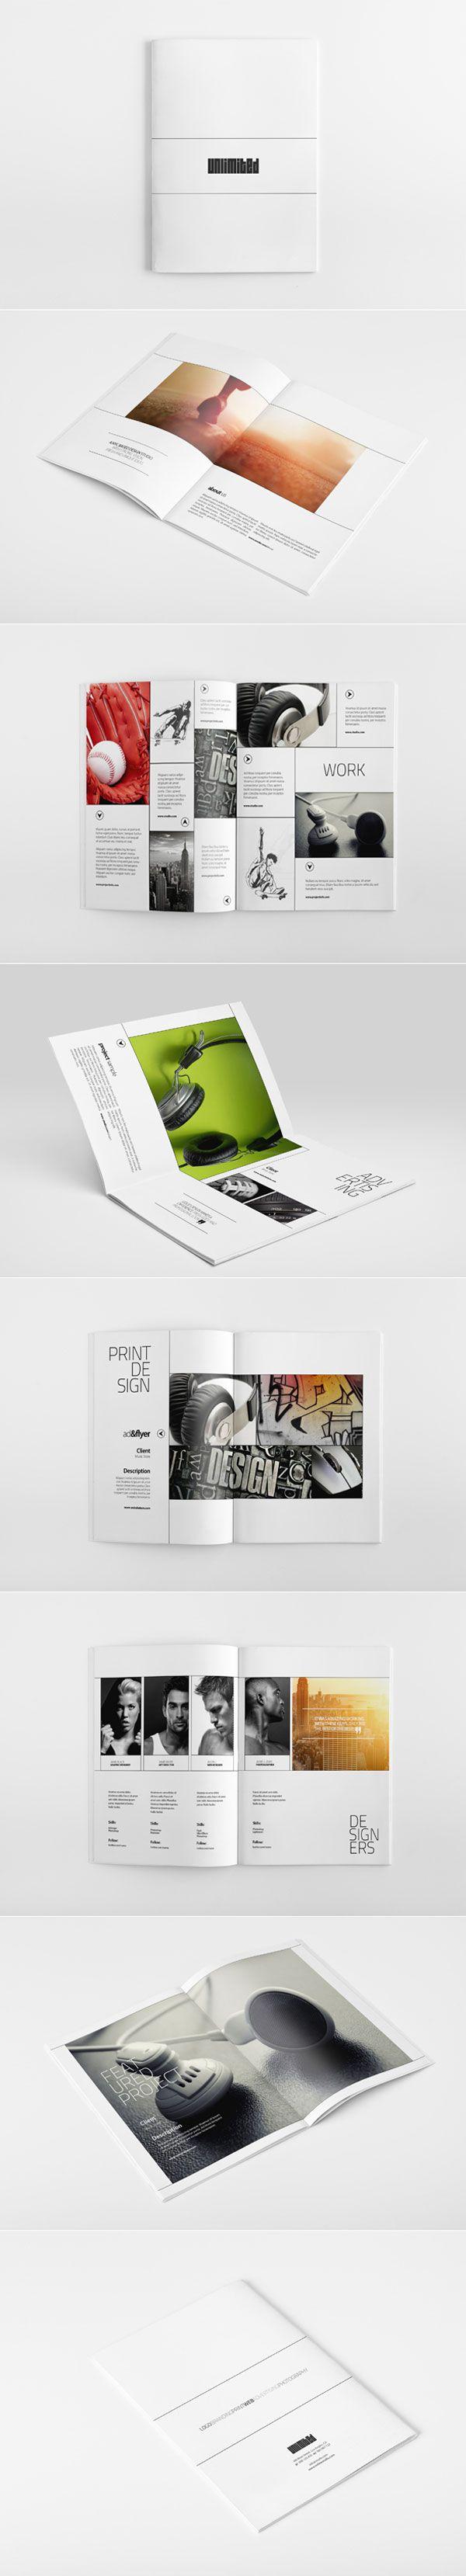 cda portfolio template - 375 best images about portfolio layout on pinterest